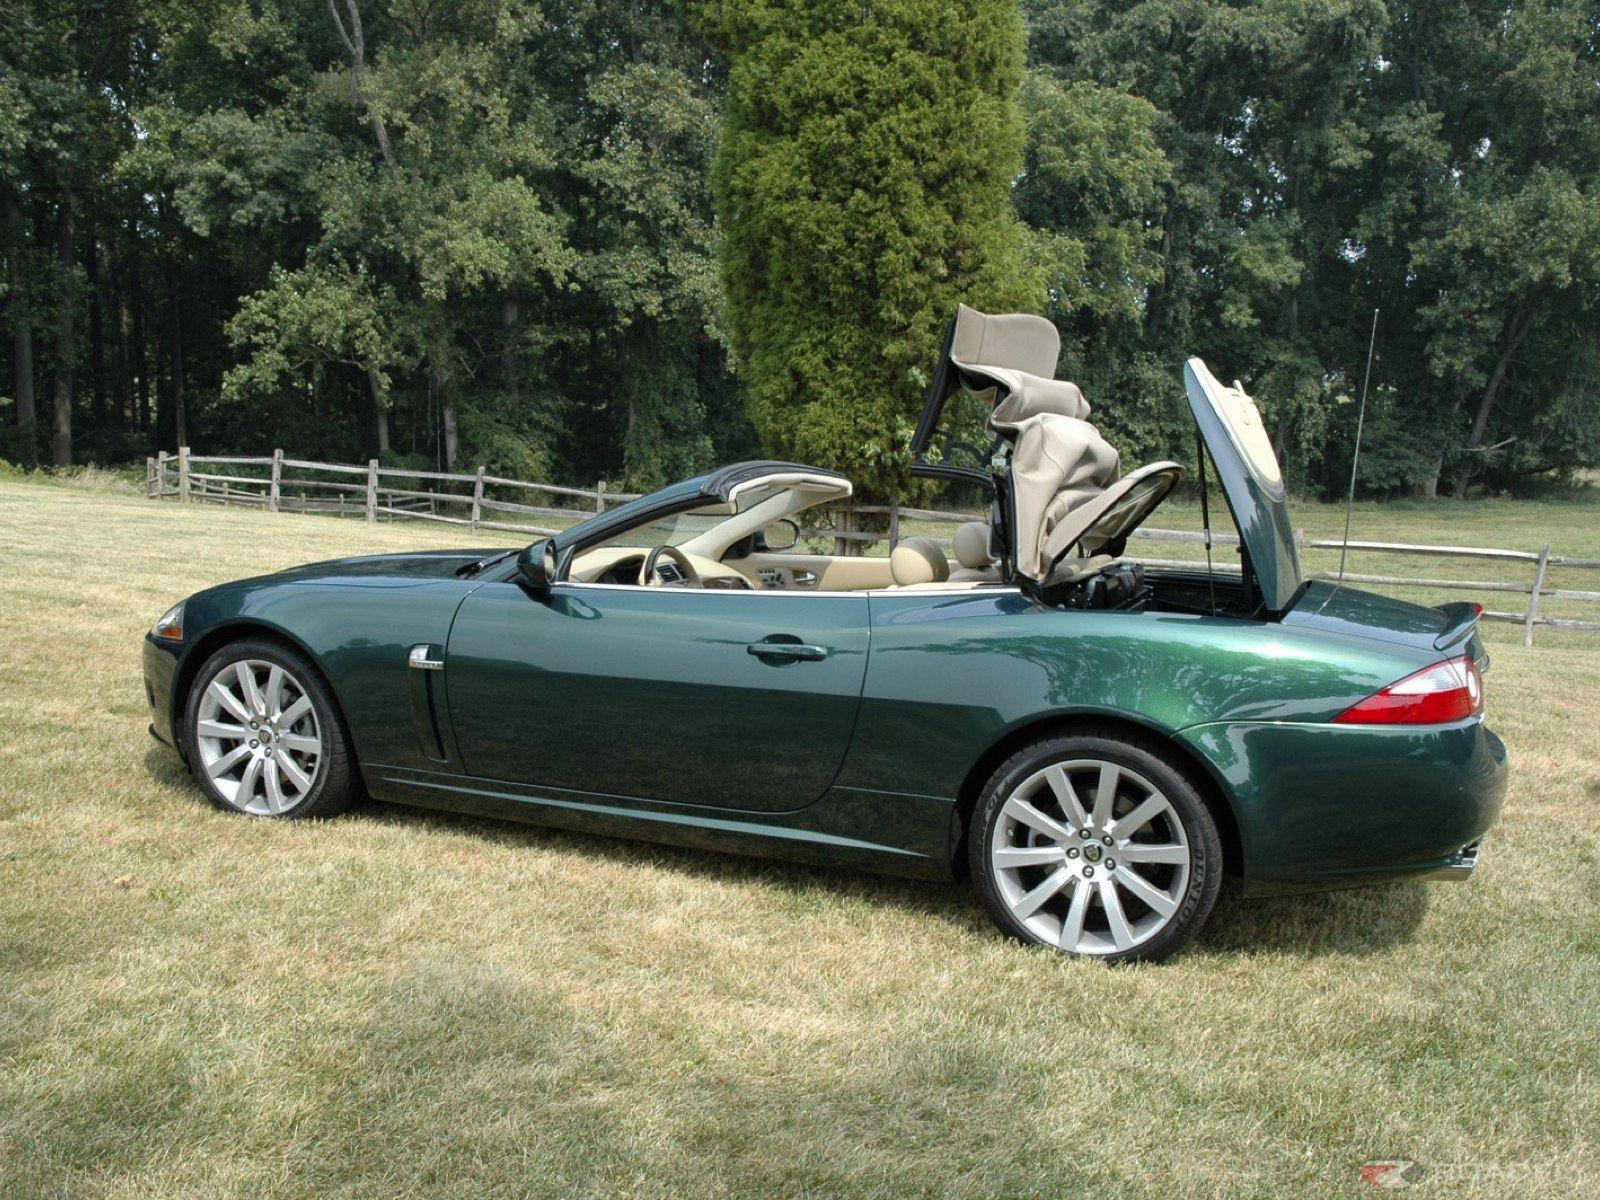 Jaguar xk wikipedia jaguar xk pinterest jaguar xk jaguar xk8 and wheels